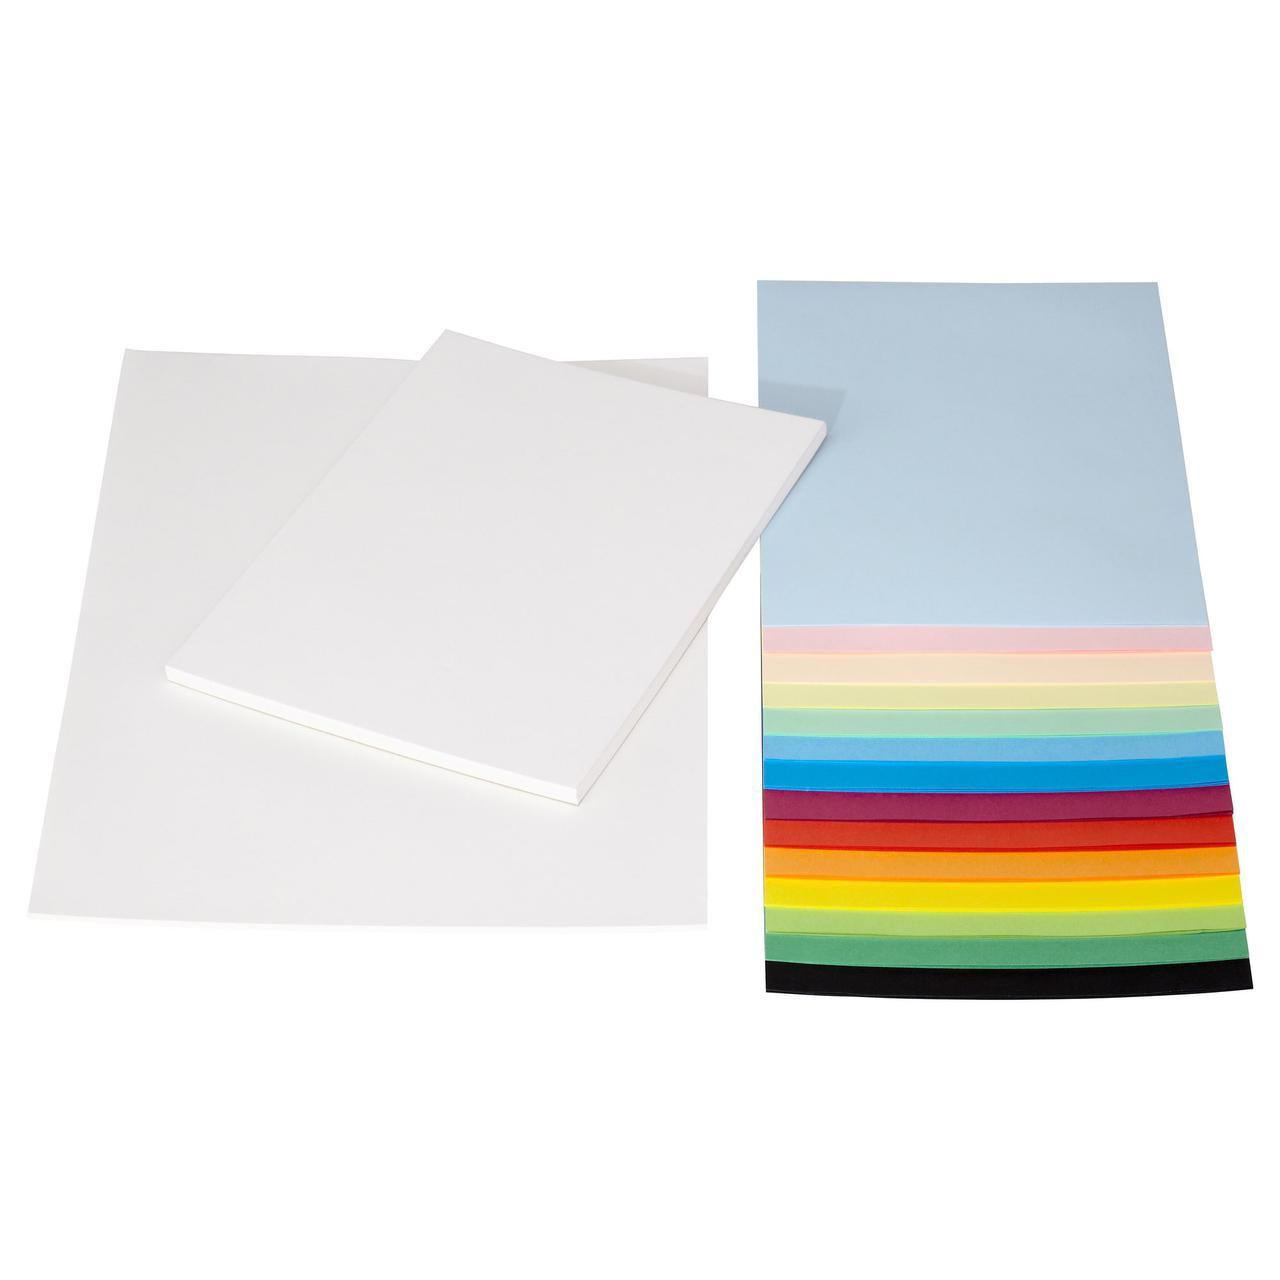 IKEA MALA (301.933.23) Бумага, разные цвета, разные цвета, разные размеры, разные размеры